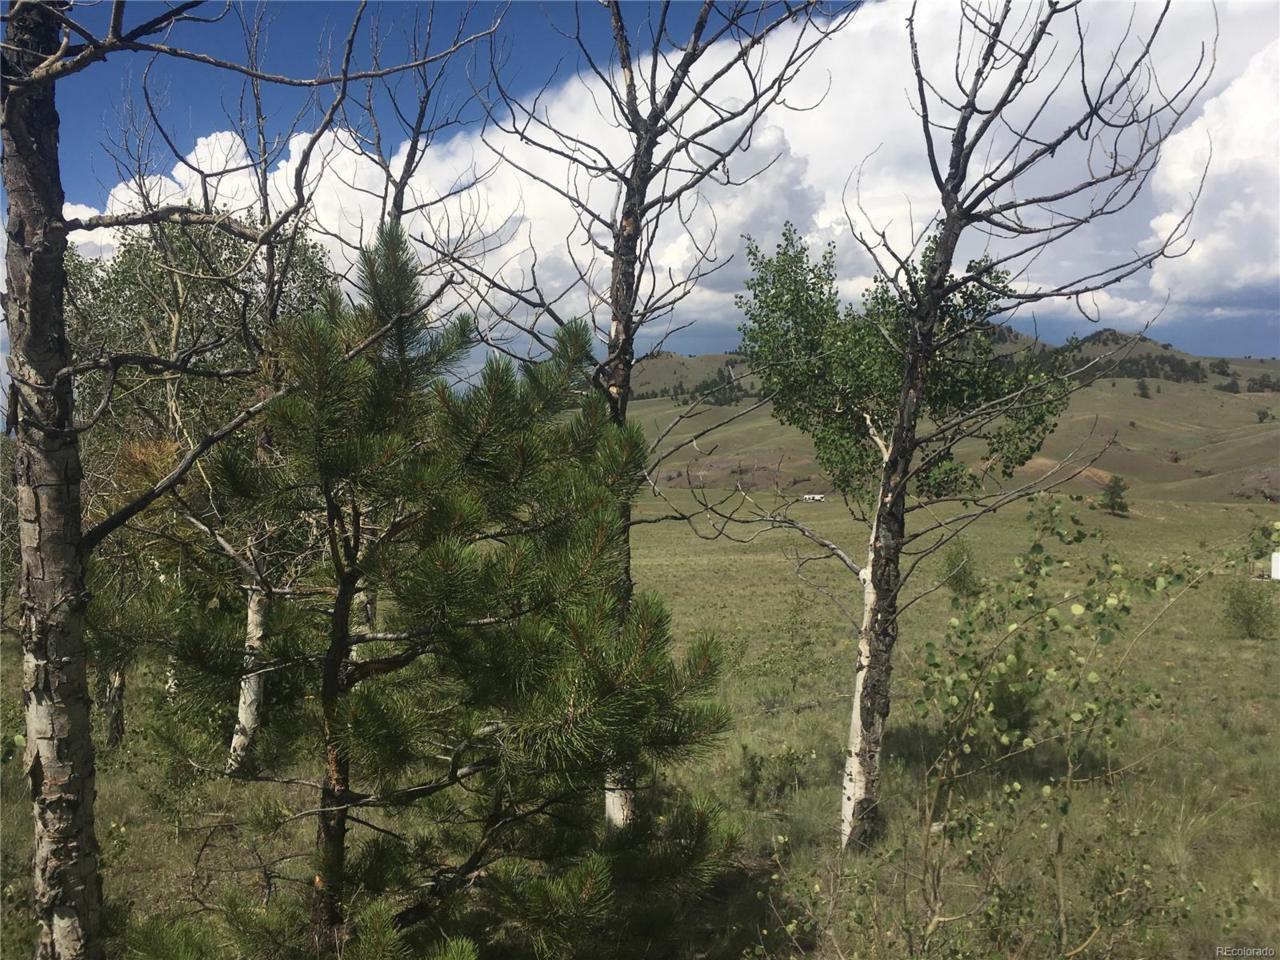 000 Cherokee Trail, Hartsel, CO 80449 (MLS #4534860) :: 8z Real Estate